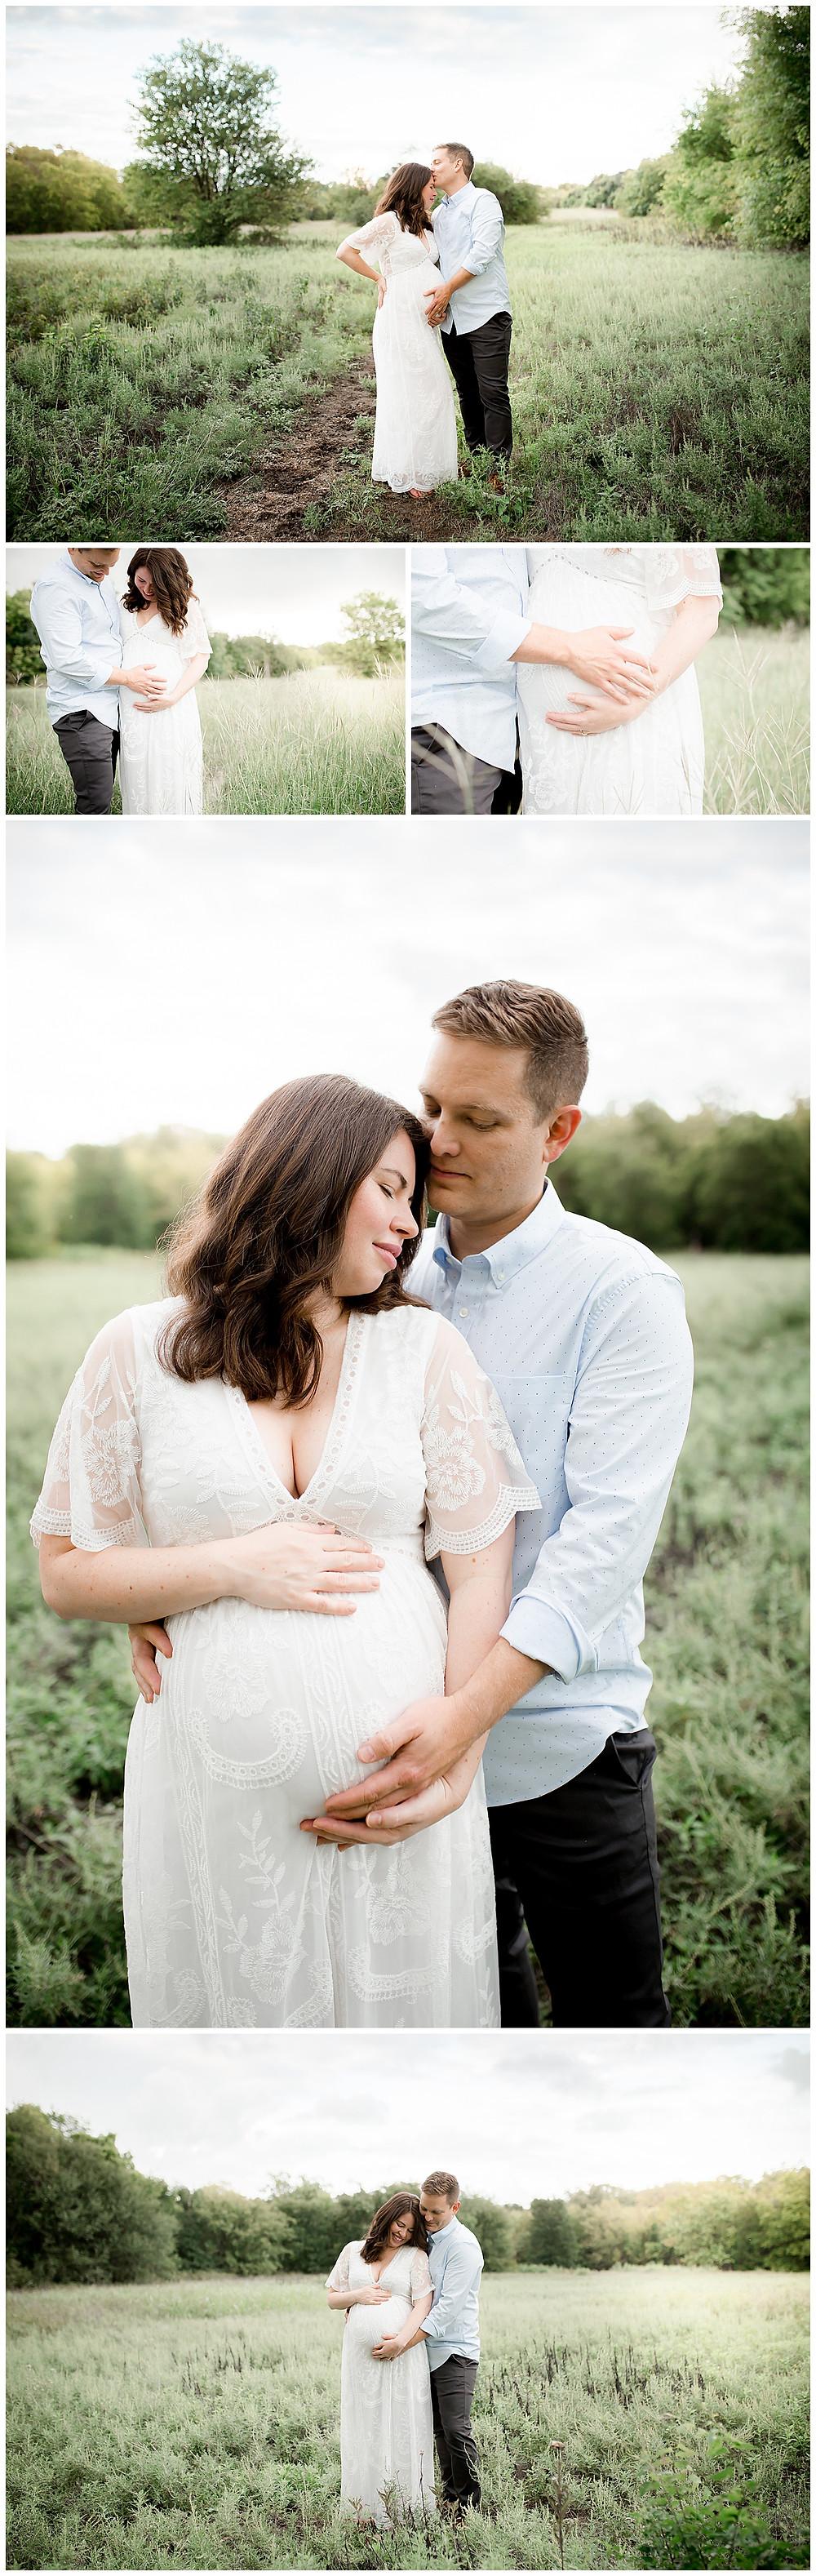 maternity photographer in Dallas, TX